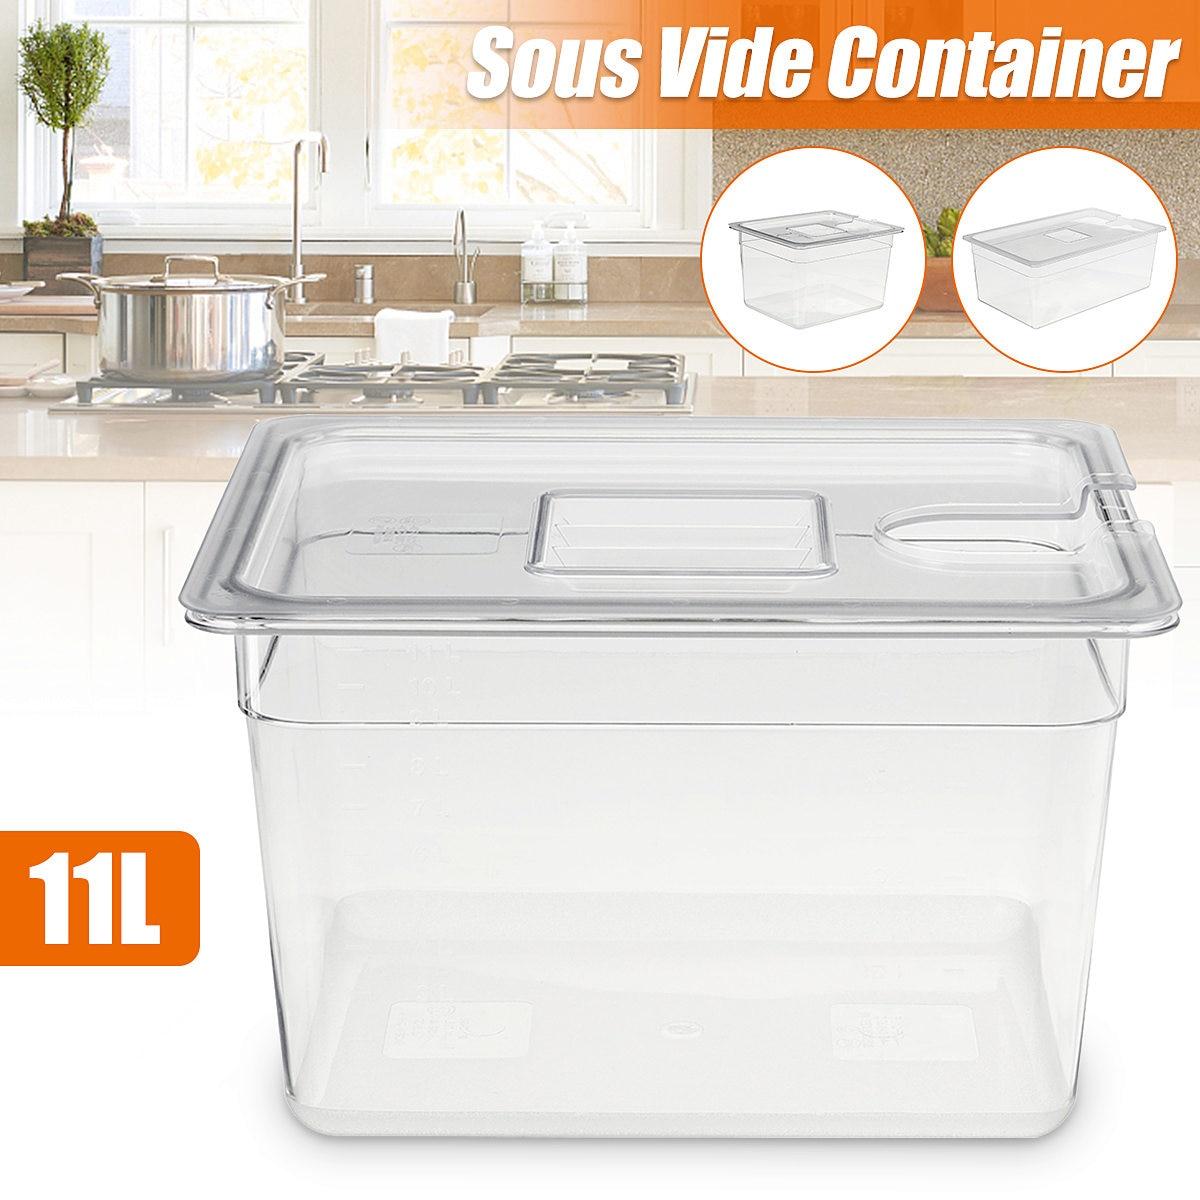 Recipiente de cocina de 11L Sous Vide, estante de acero inoxidable Sous...